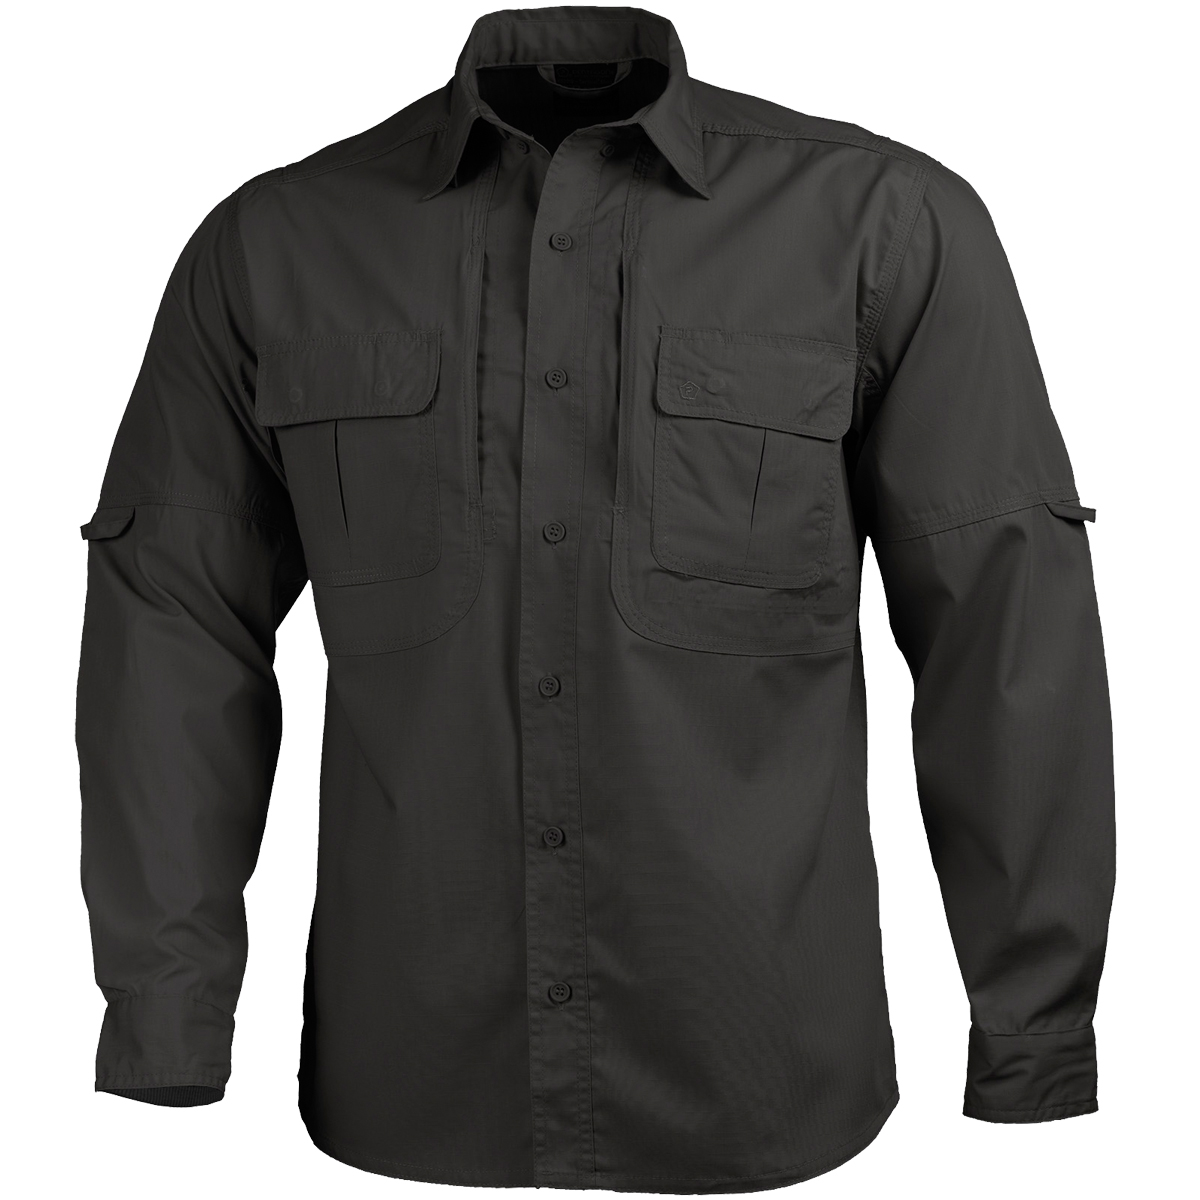 pentagon tactical shirt black tactical military 1st